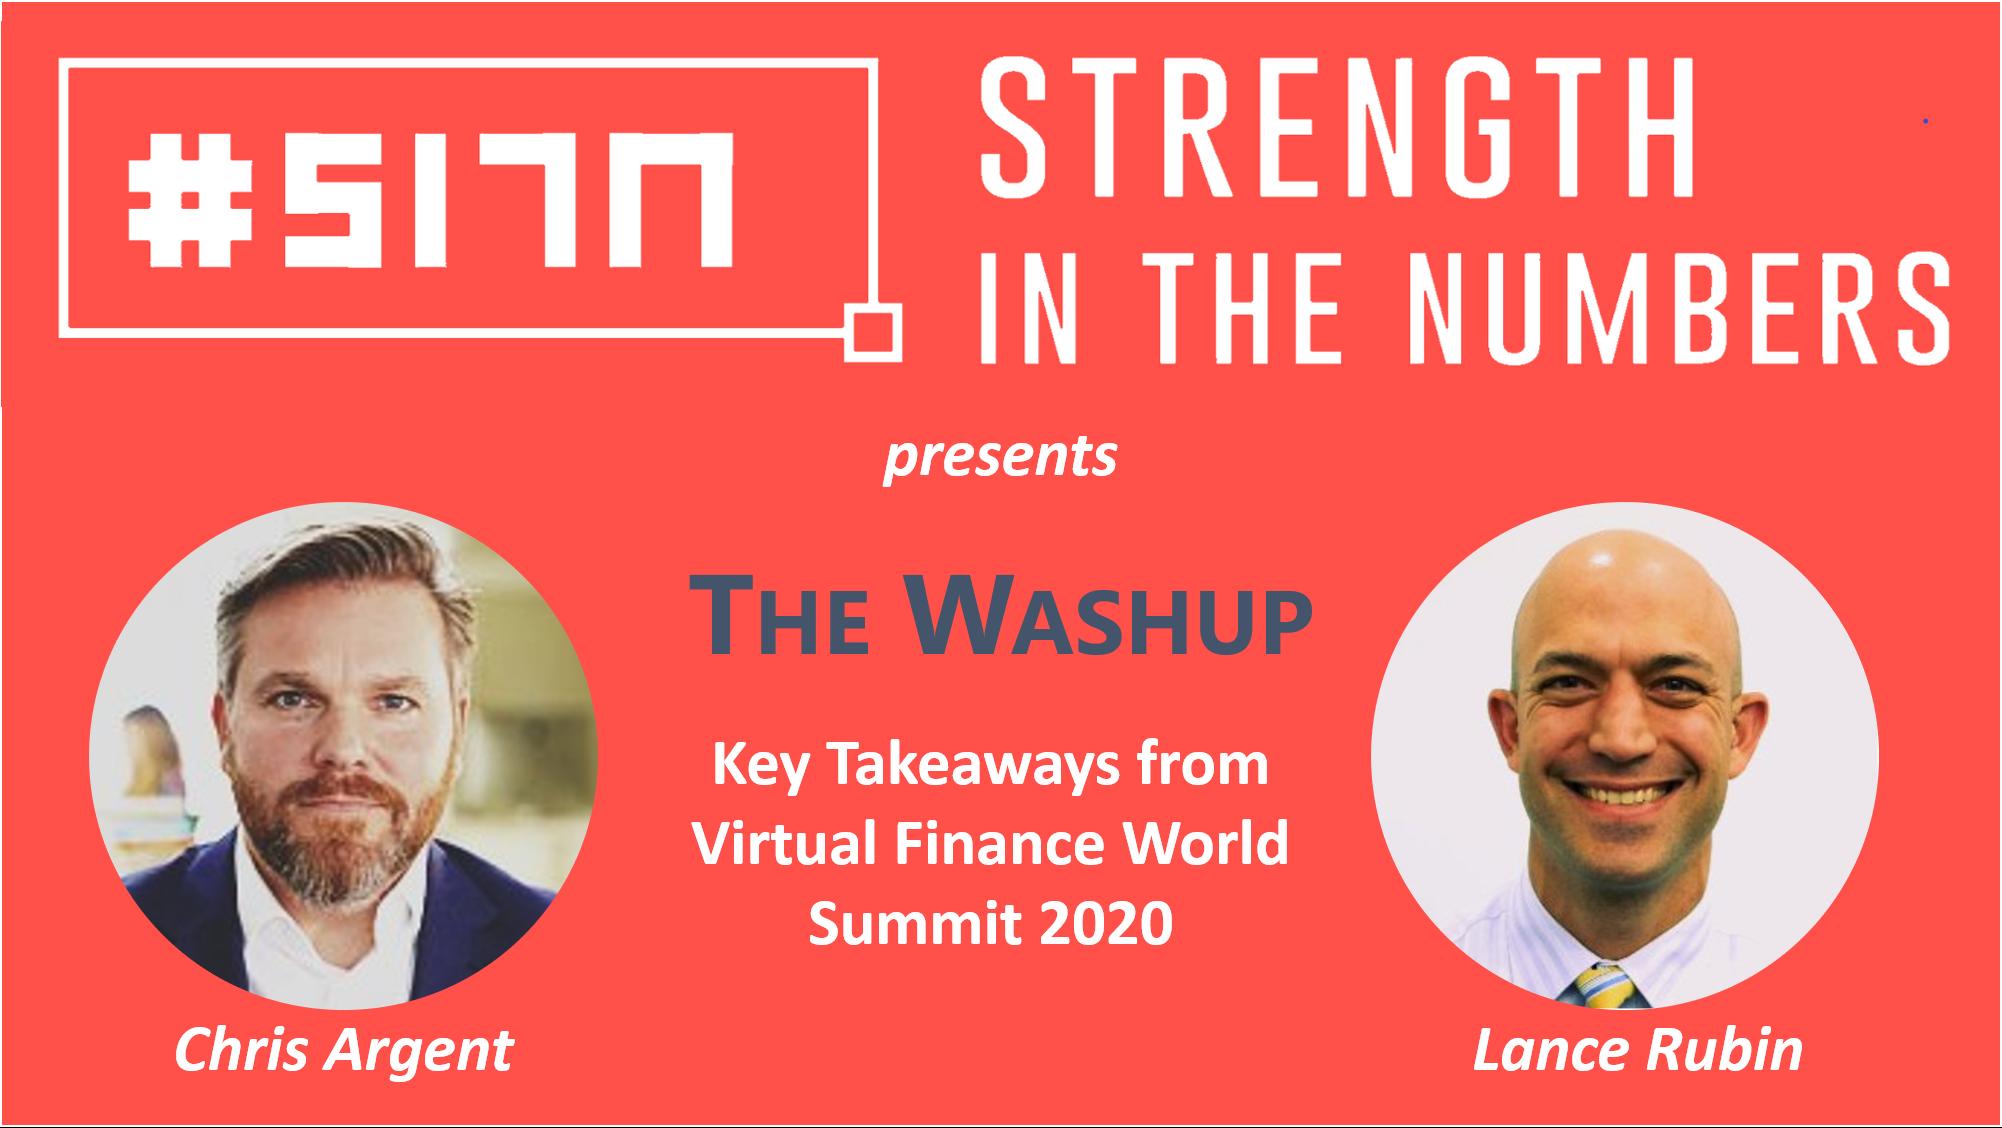 #246: THE WASHUP: Key Takeaways from Virtual Finance World Summit 2020